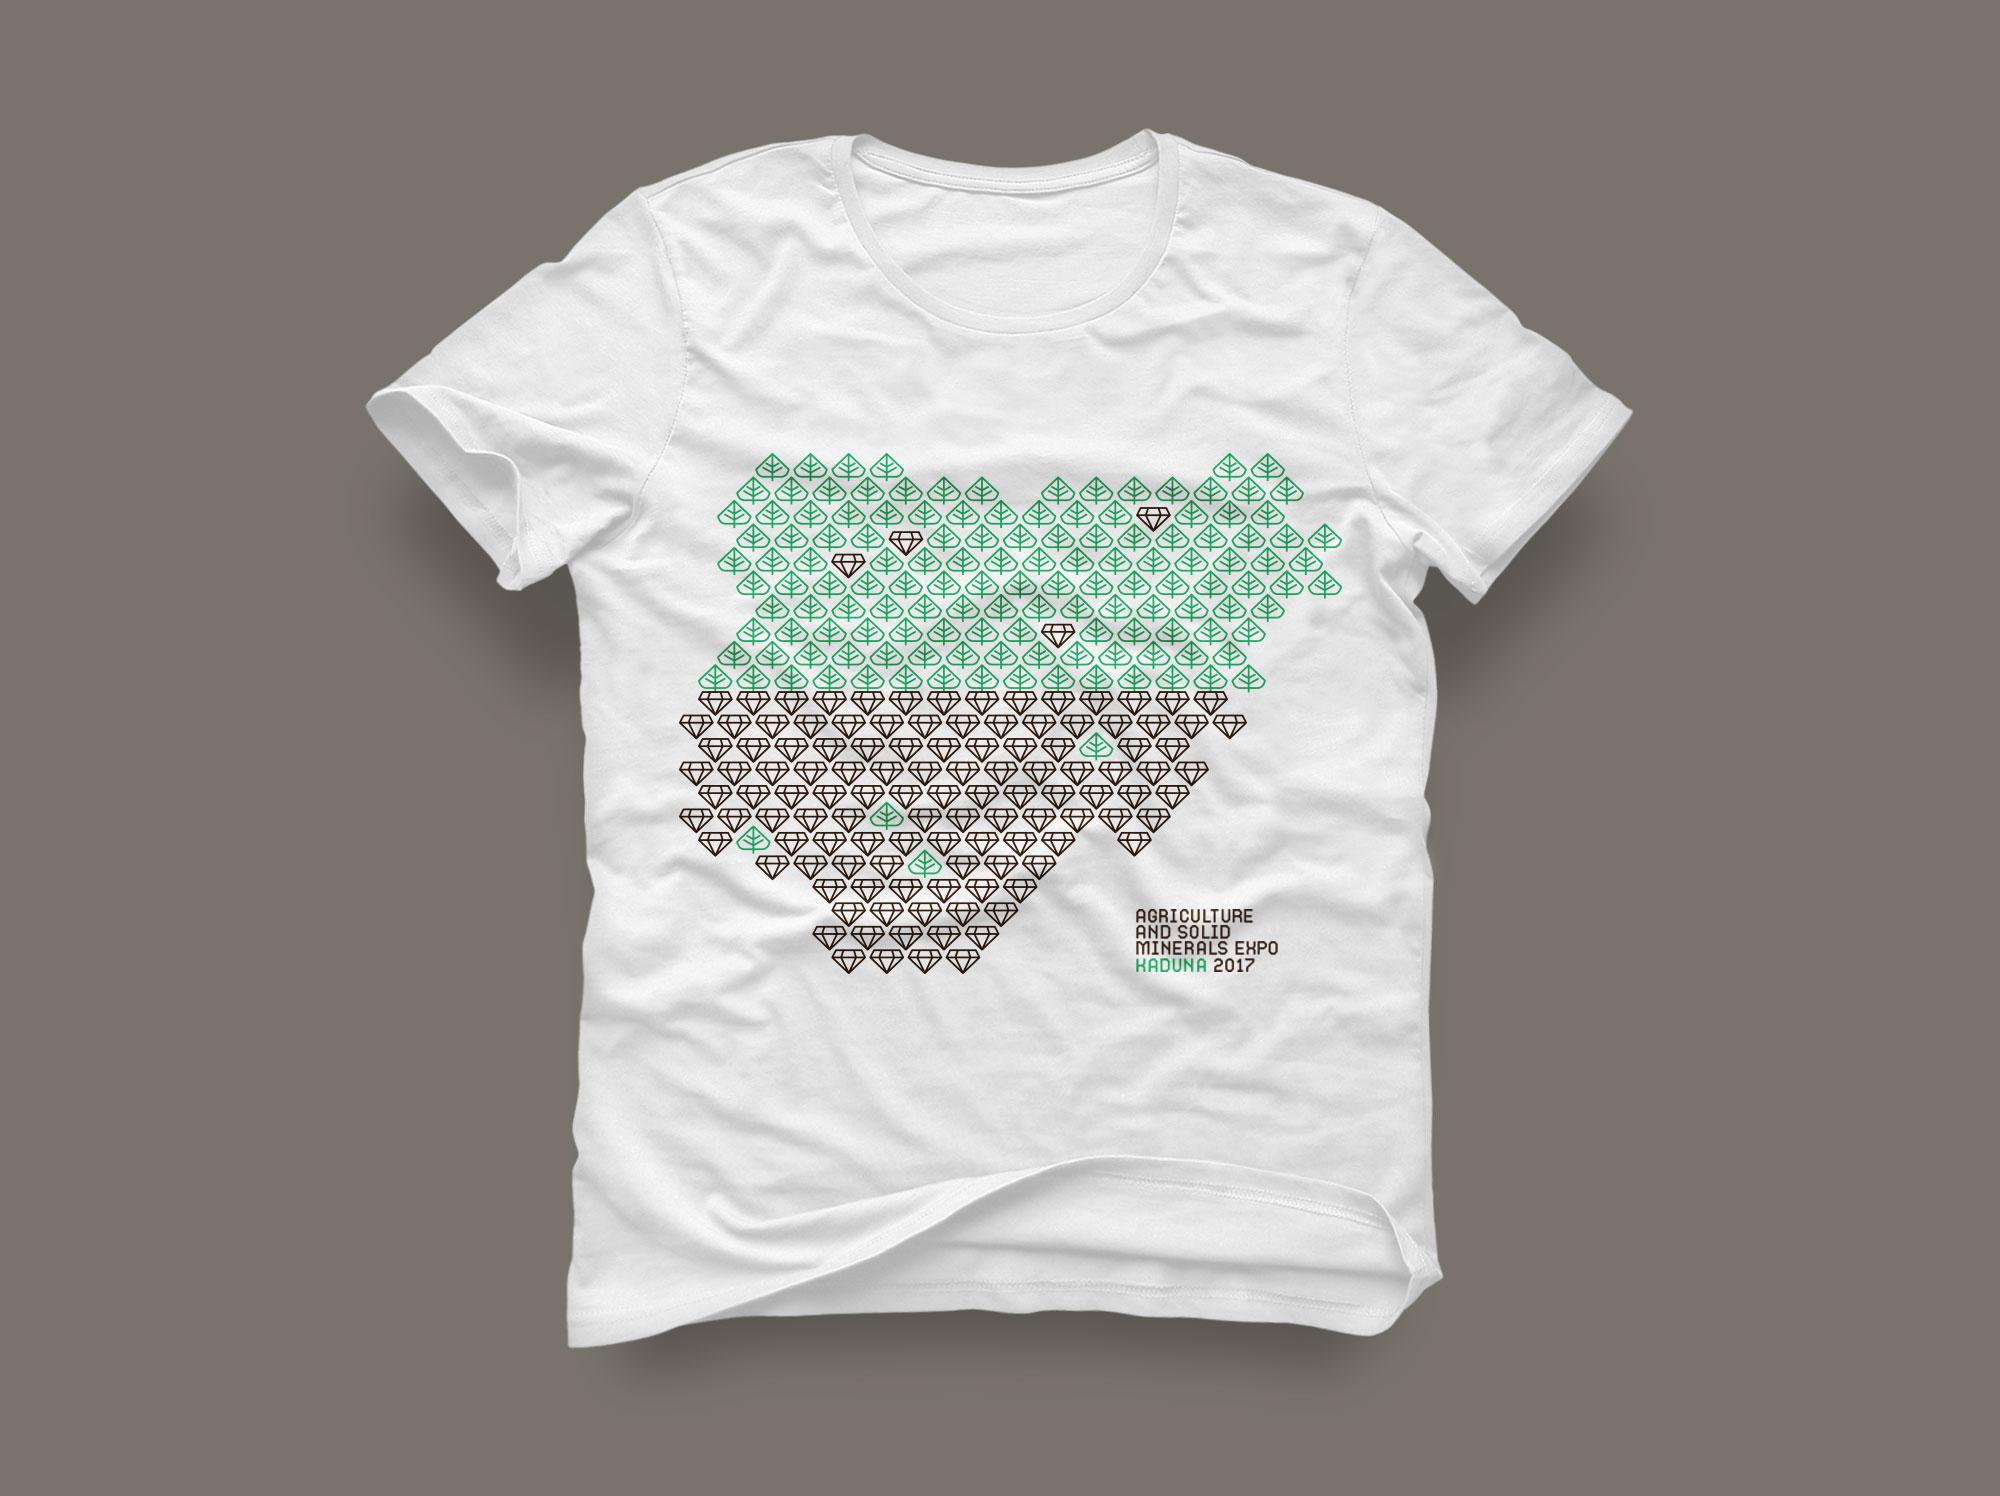 kaduna-shirt-1